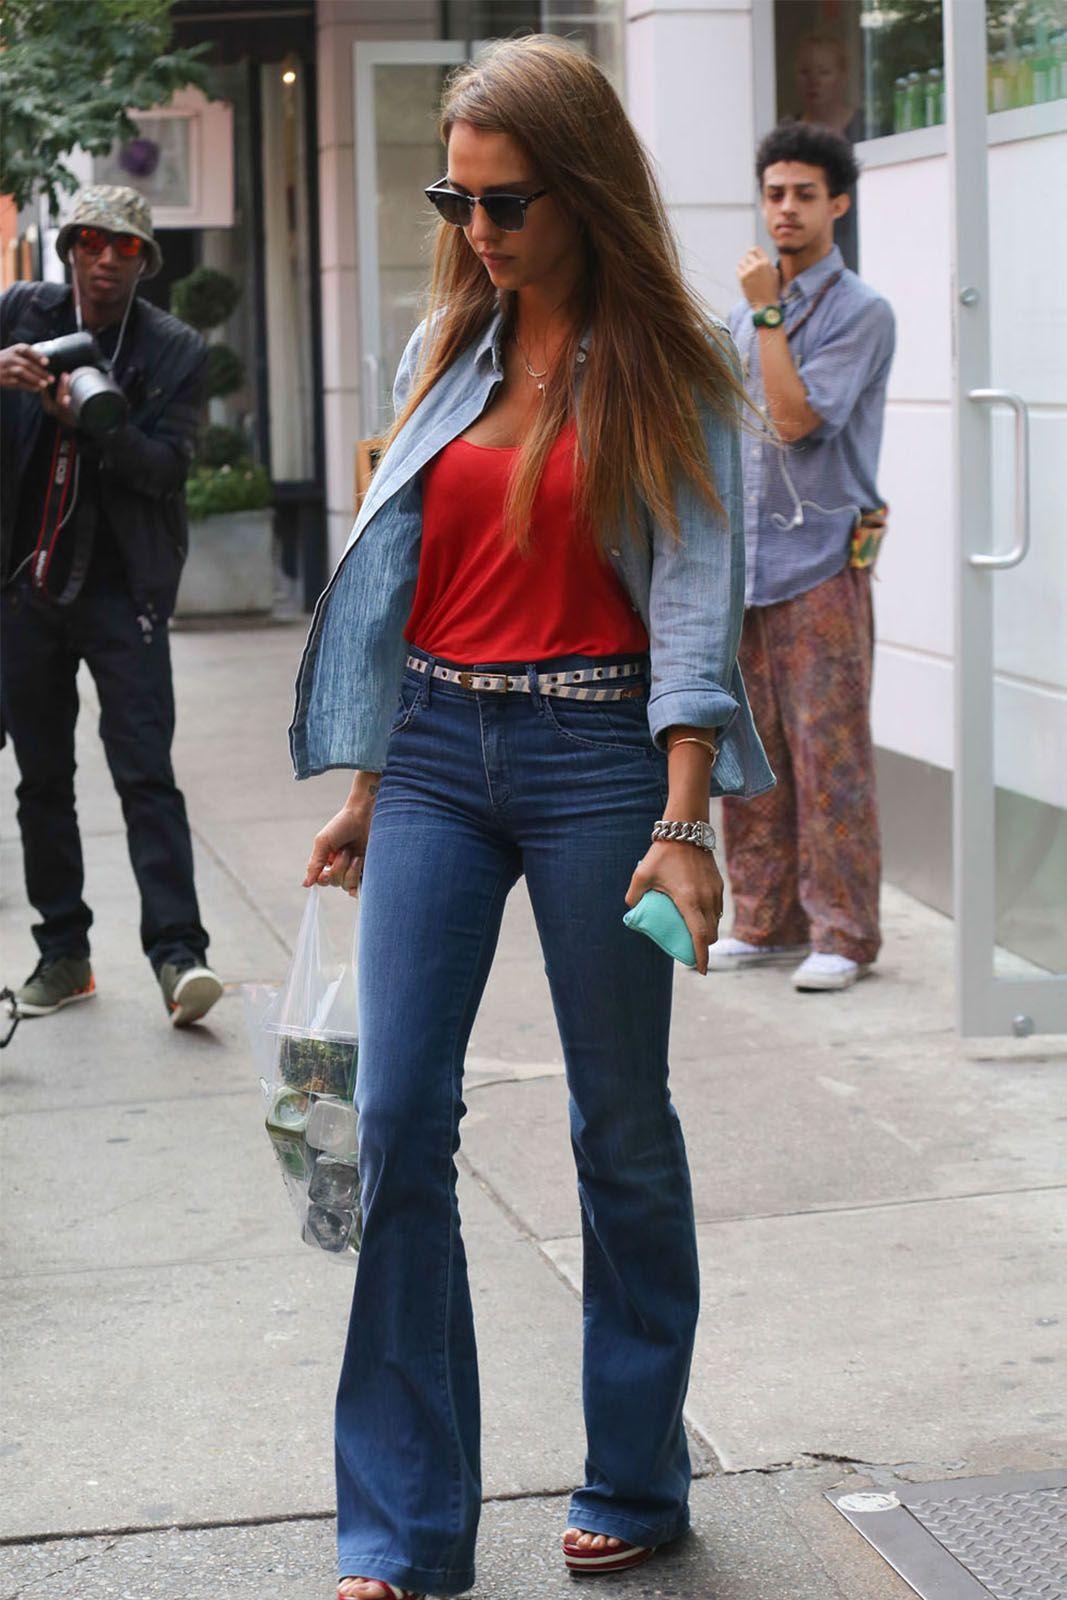 Trending! Intip Mix N Match Bell Bottom Jeans Di Sini